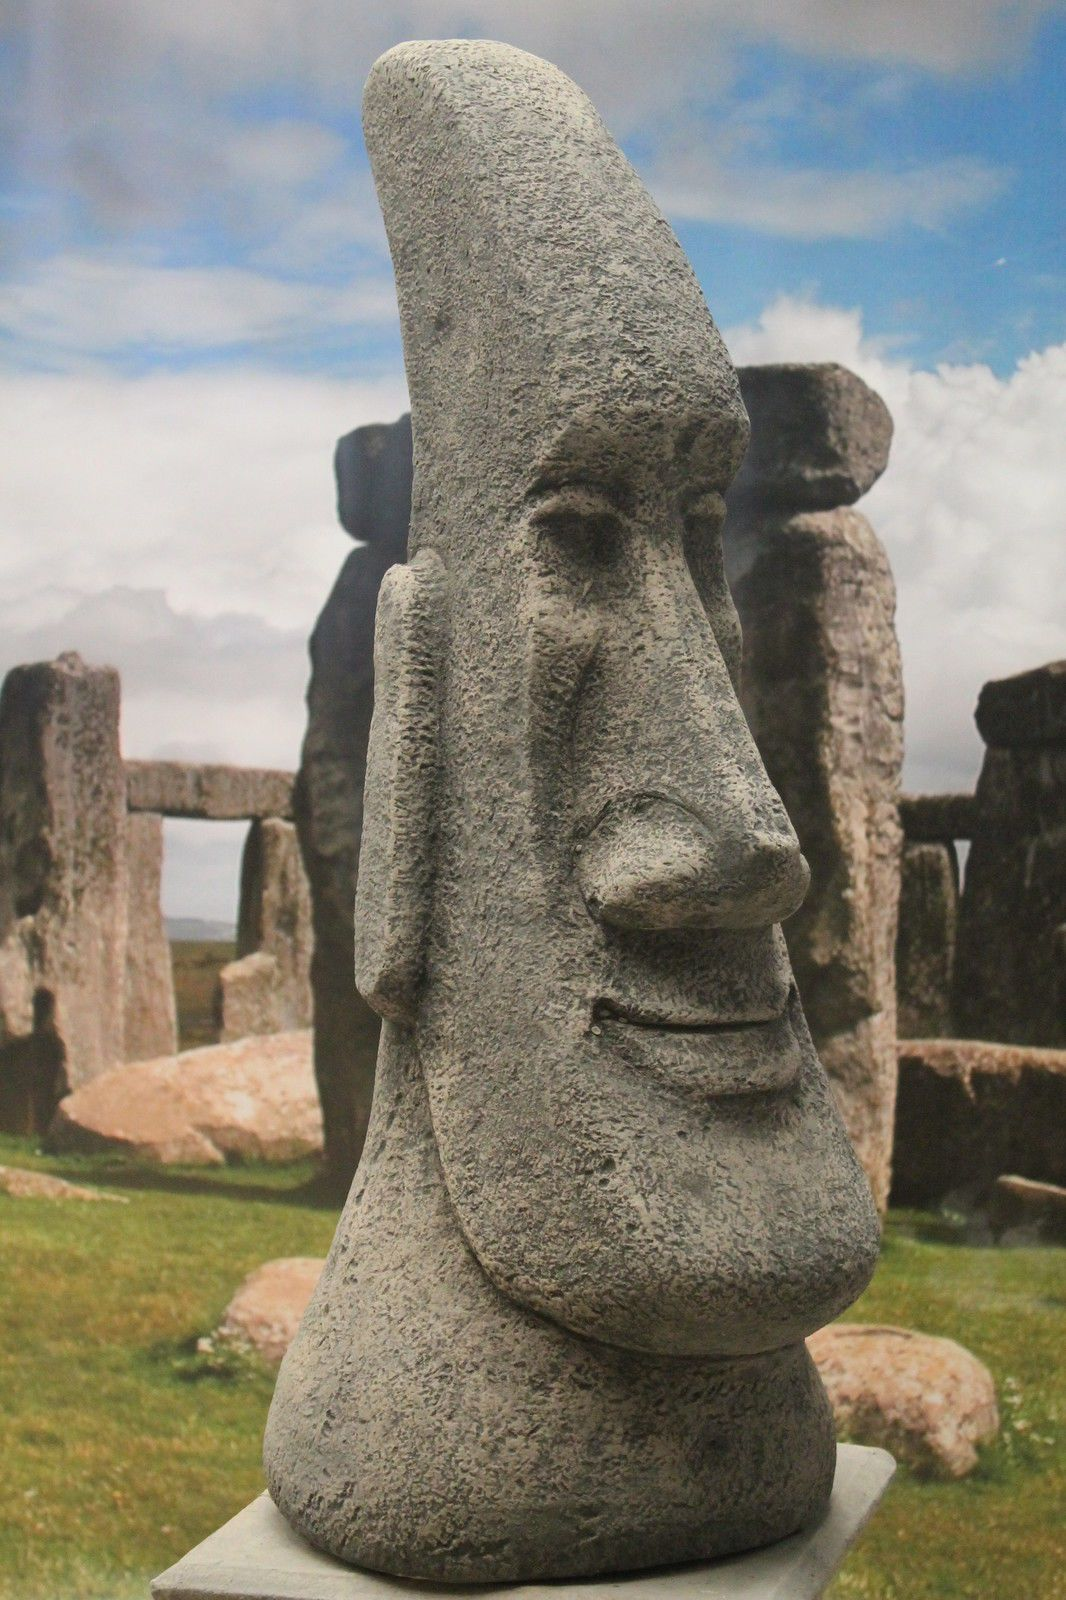 LARGE EASTER ISLAND STONE HEAD STATUE GARDEN ORNAMENT | EBay